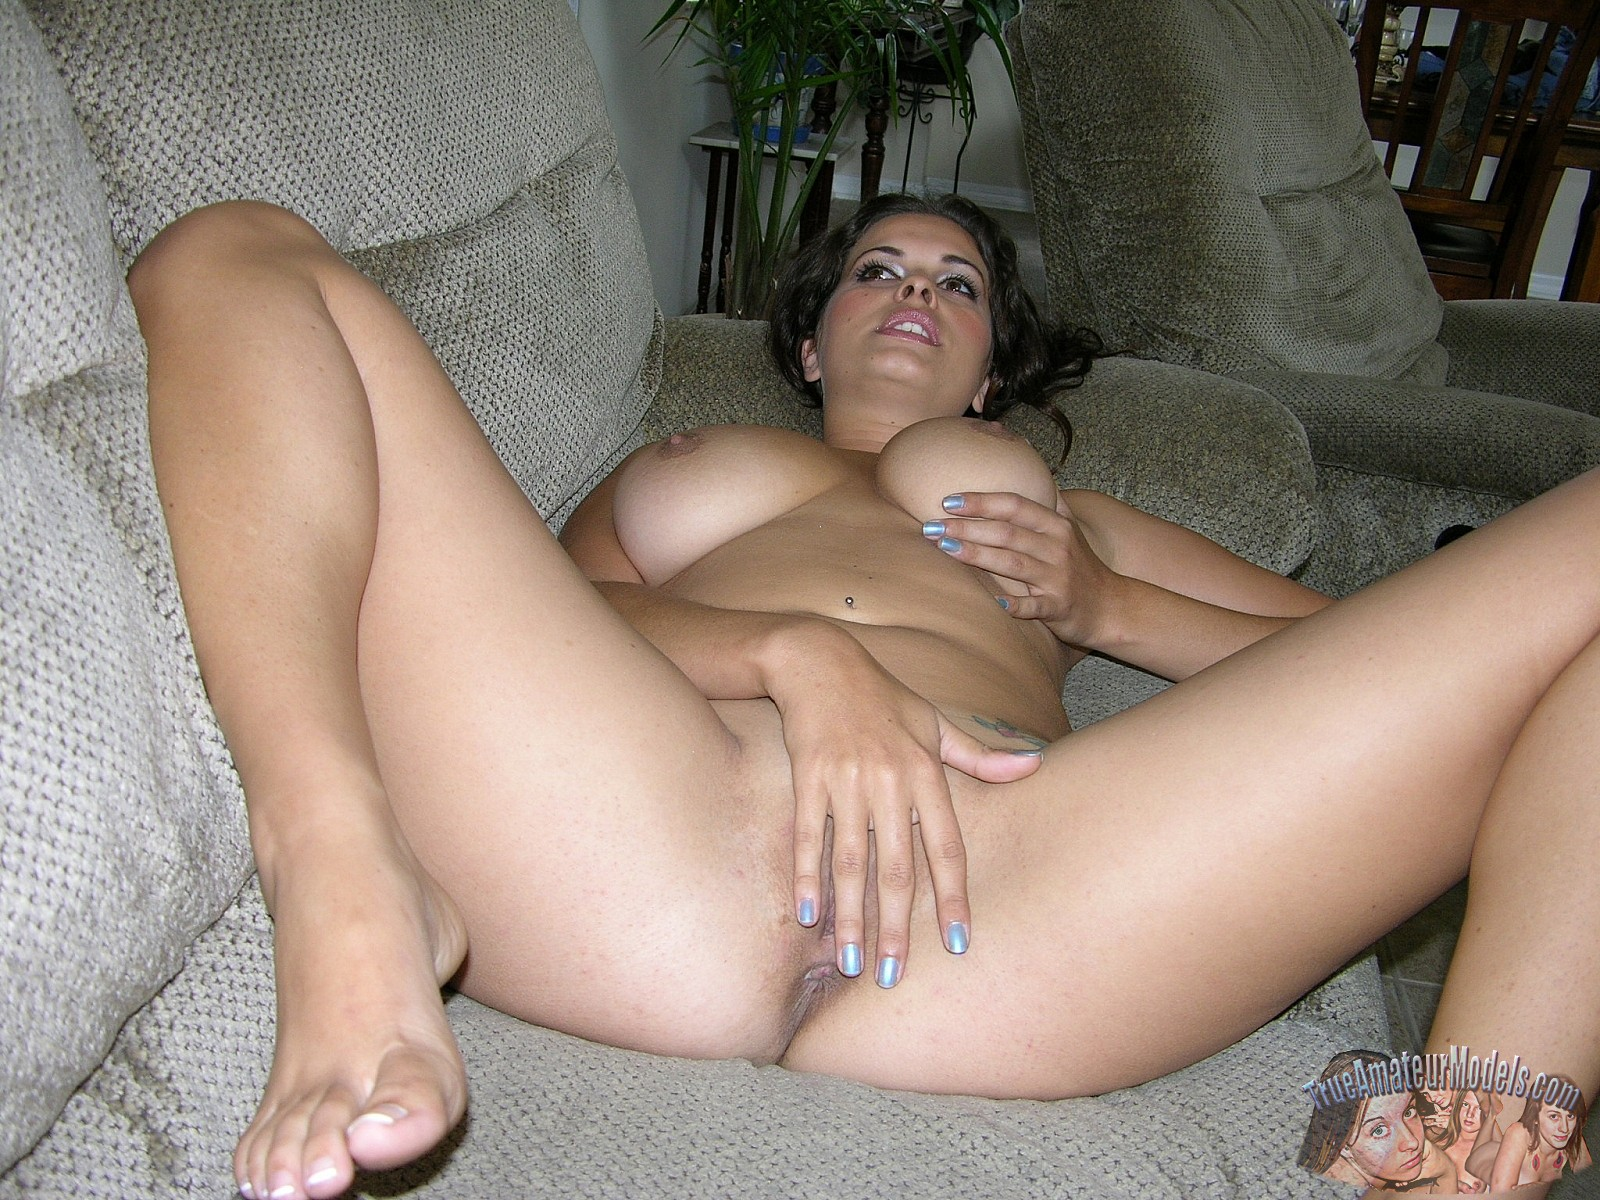 Virgin Woman